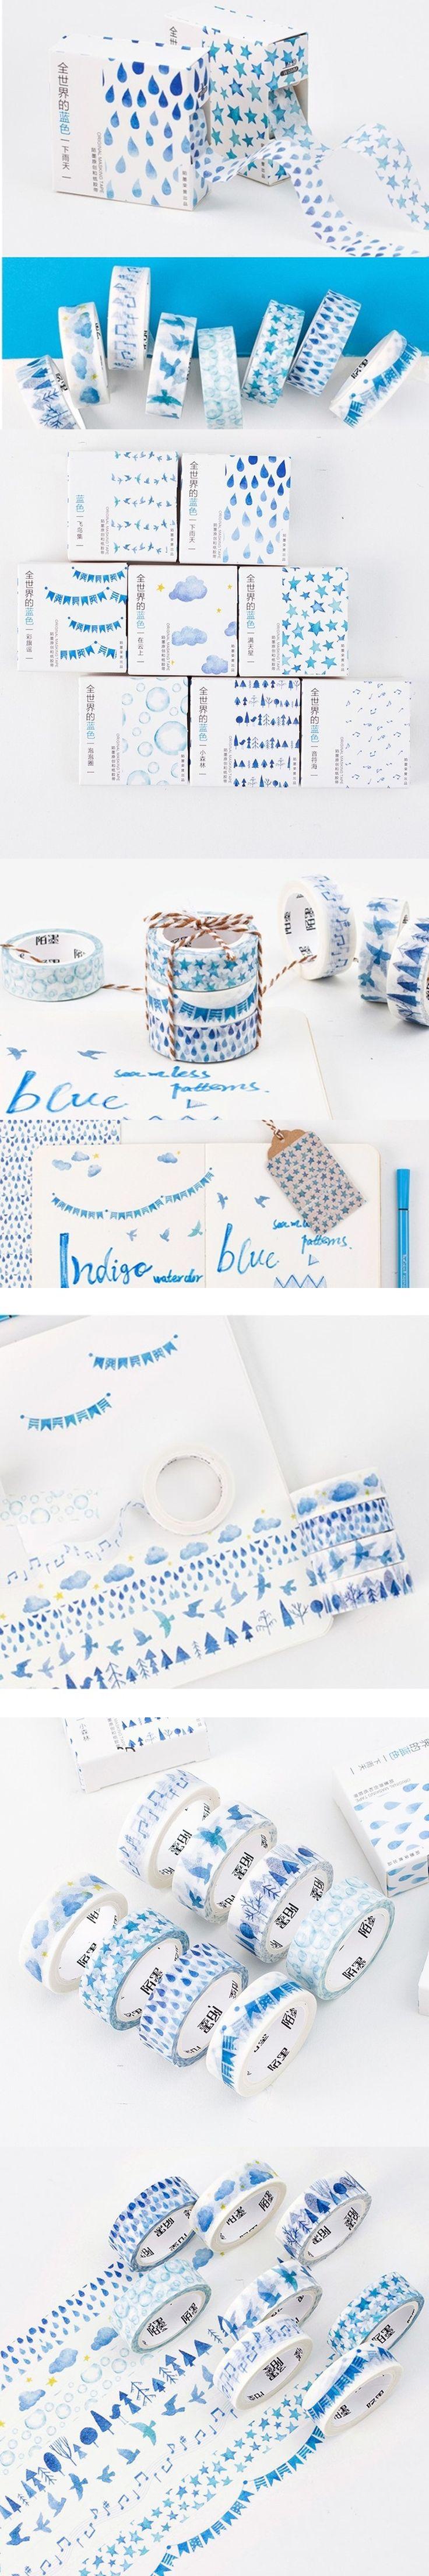 8 pcs/Lot Blue world masking tape set 15mm*7m scrapbooking sticker washitape School supplies cinta adhesiva decorativa FJ682